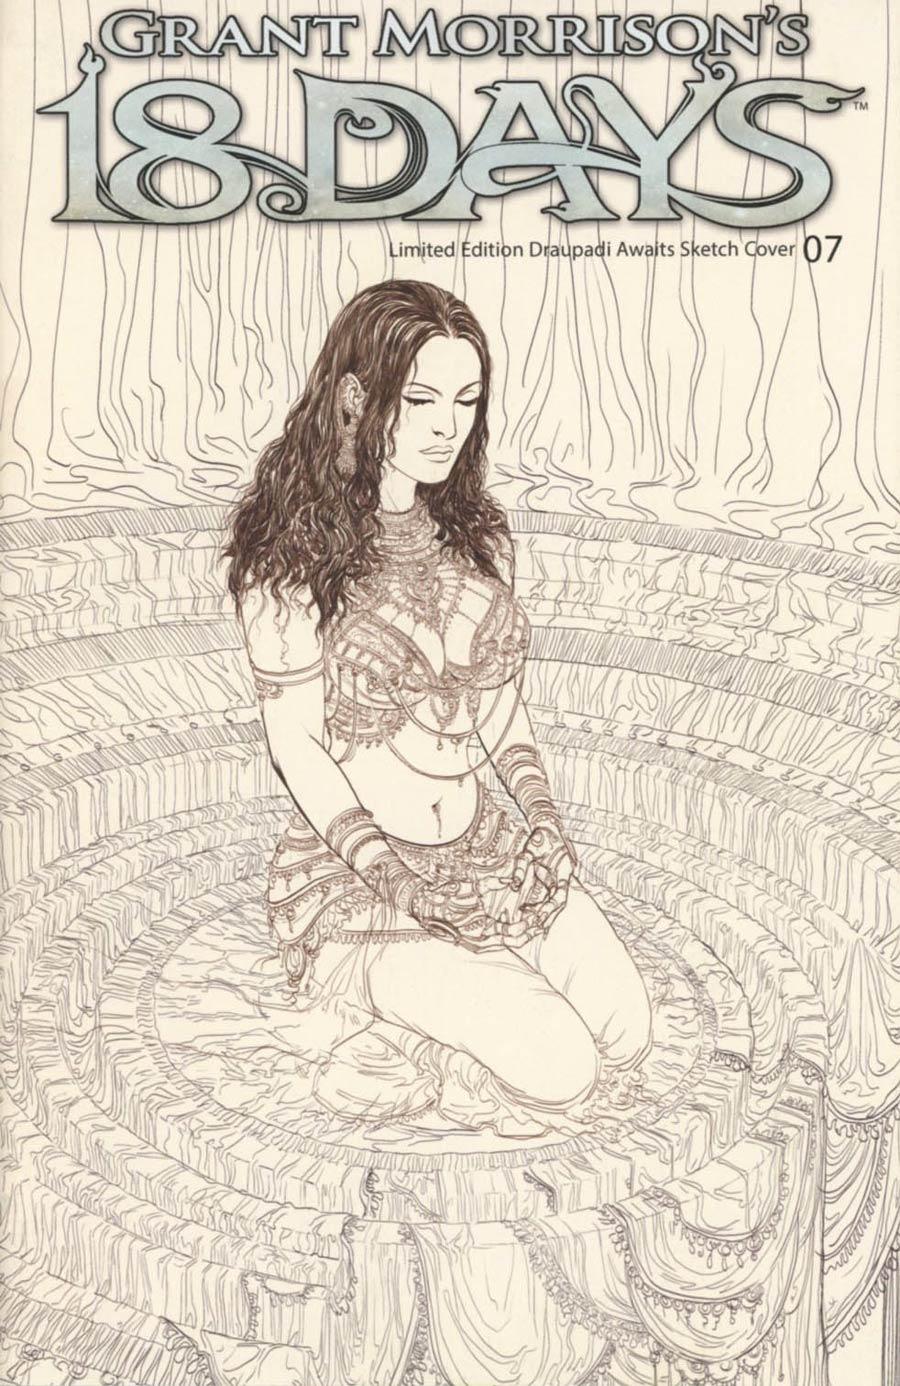 Grant Morrisons 18 Days #7 Cover C Variant Draupadi Awaits Sketch Cover